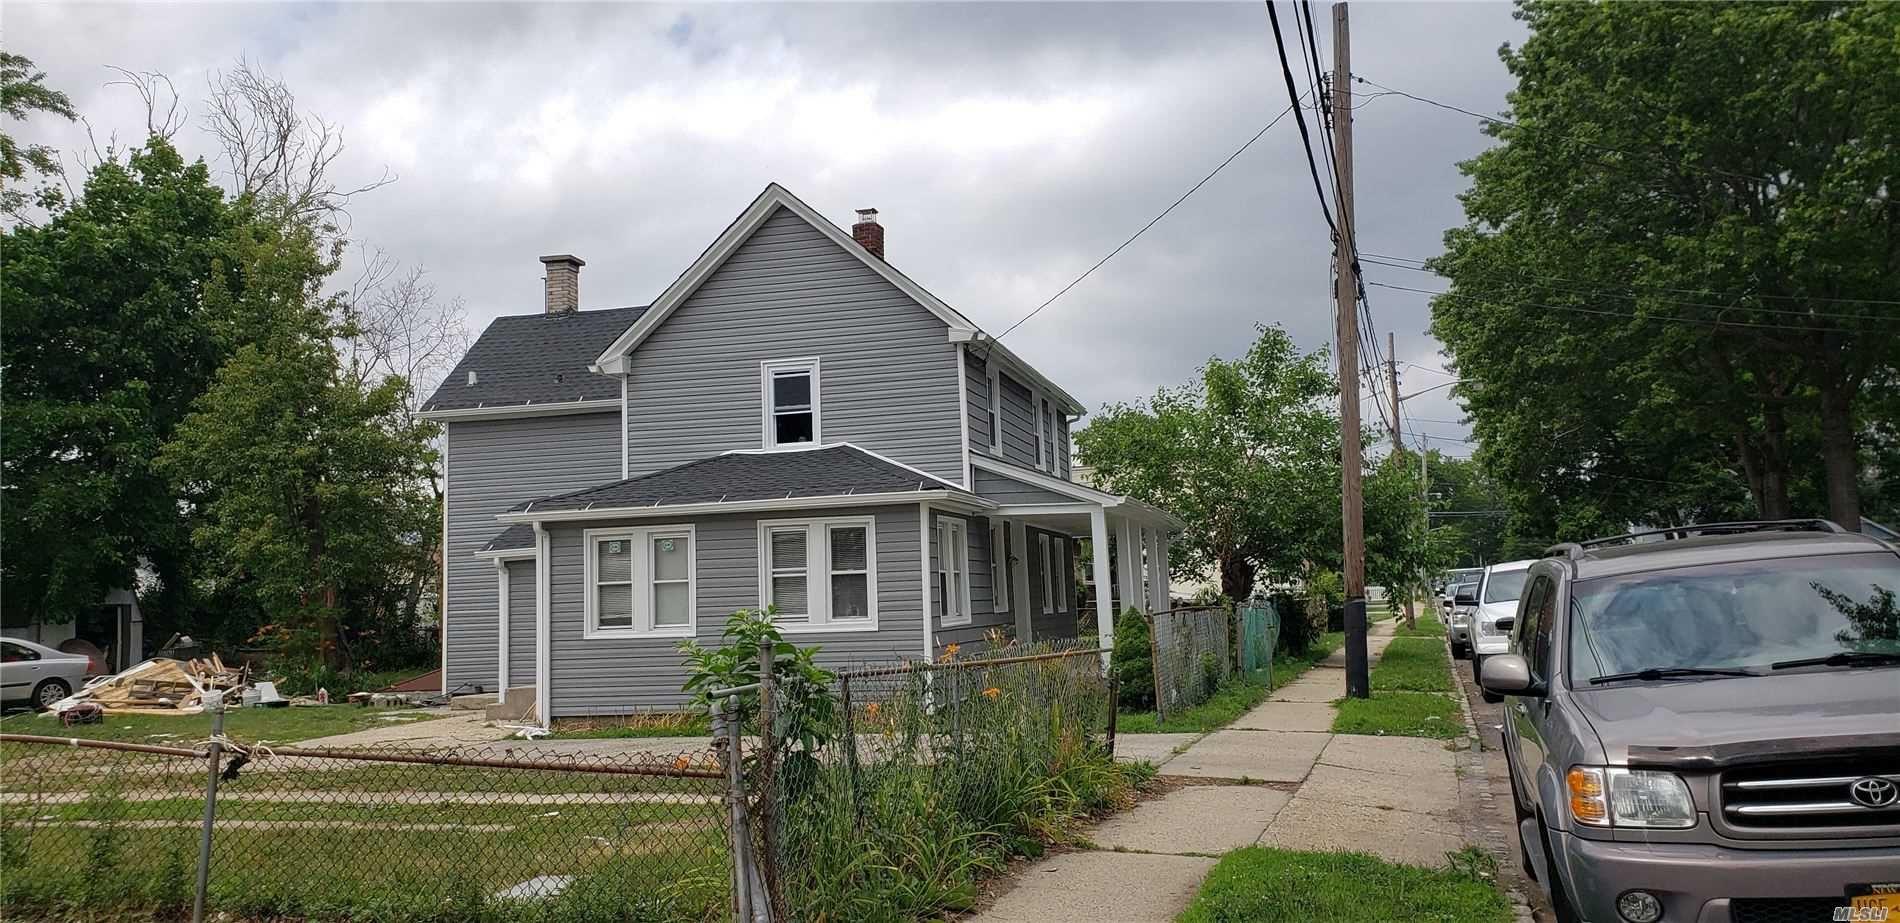 227 Brook Street, Westbury, NY 11590 - MLS#: 3235225